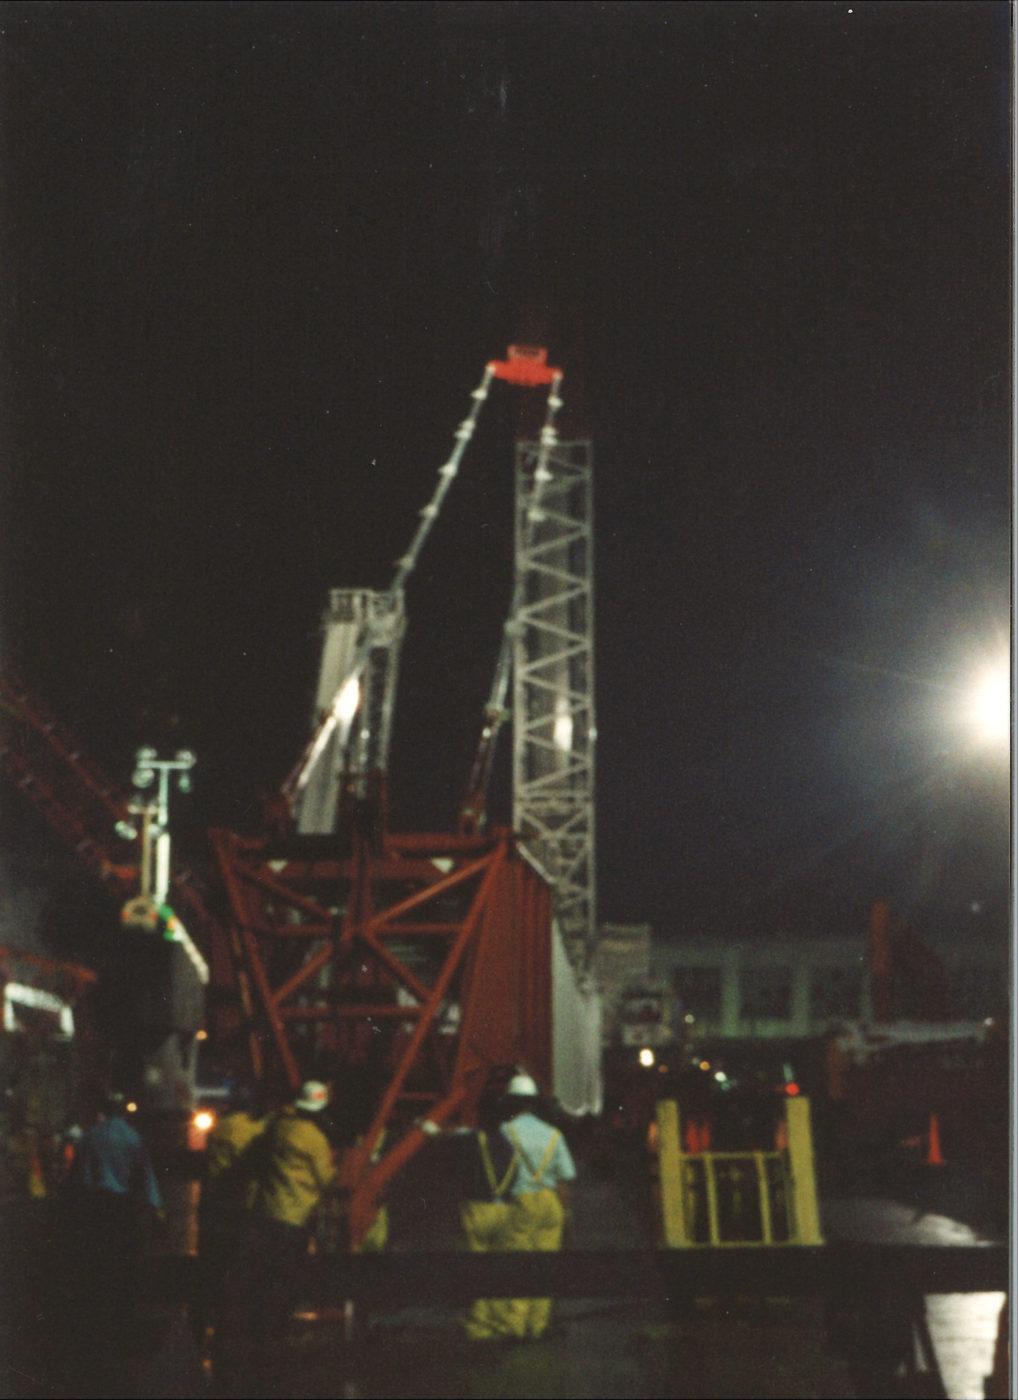 Men working on a crane at night